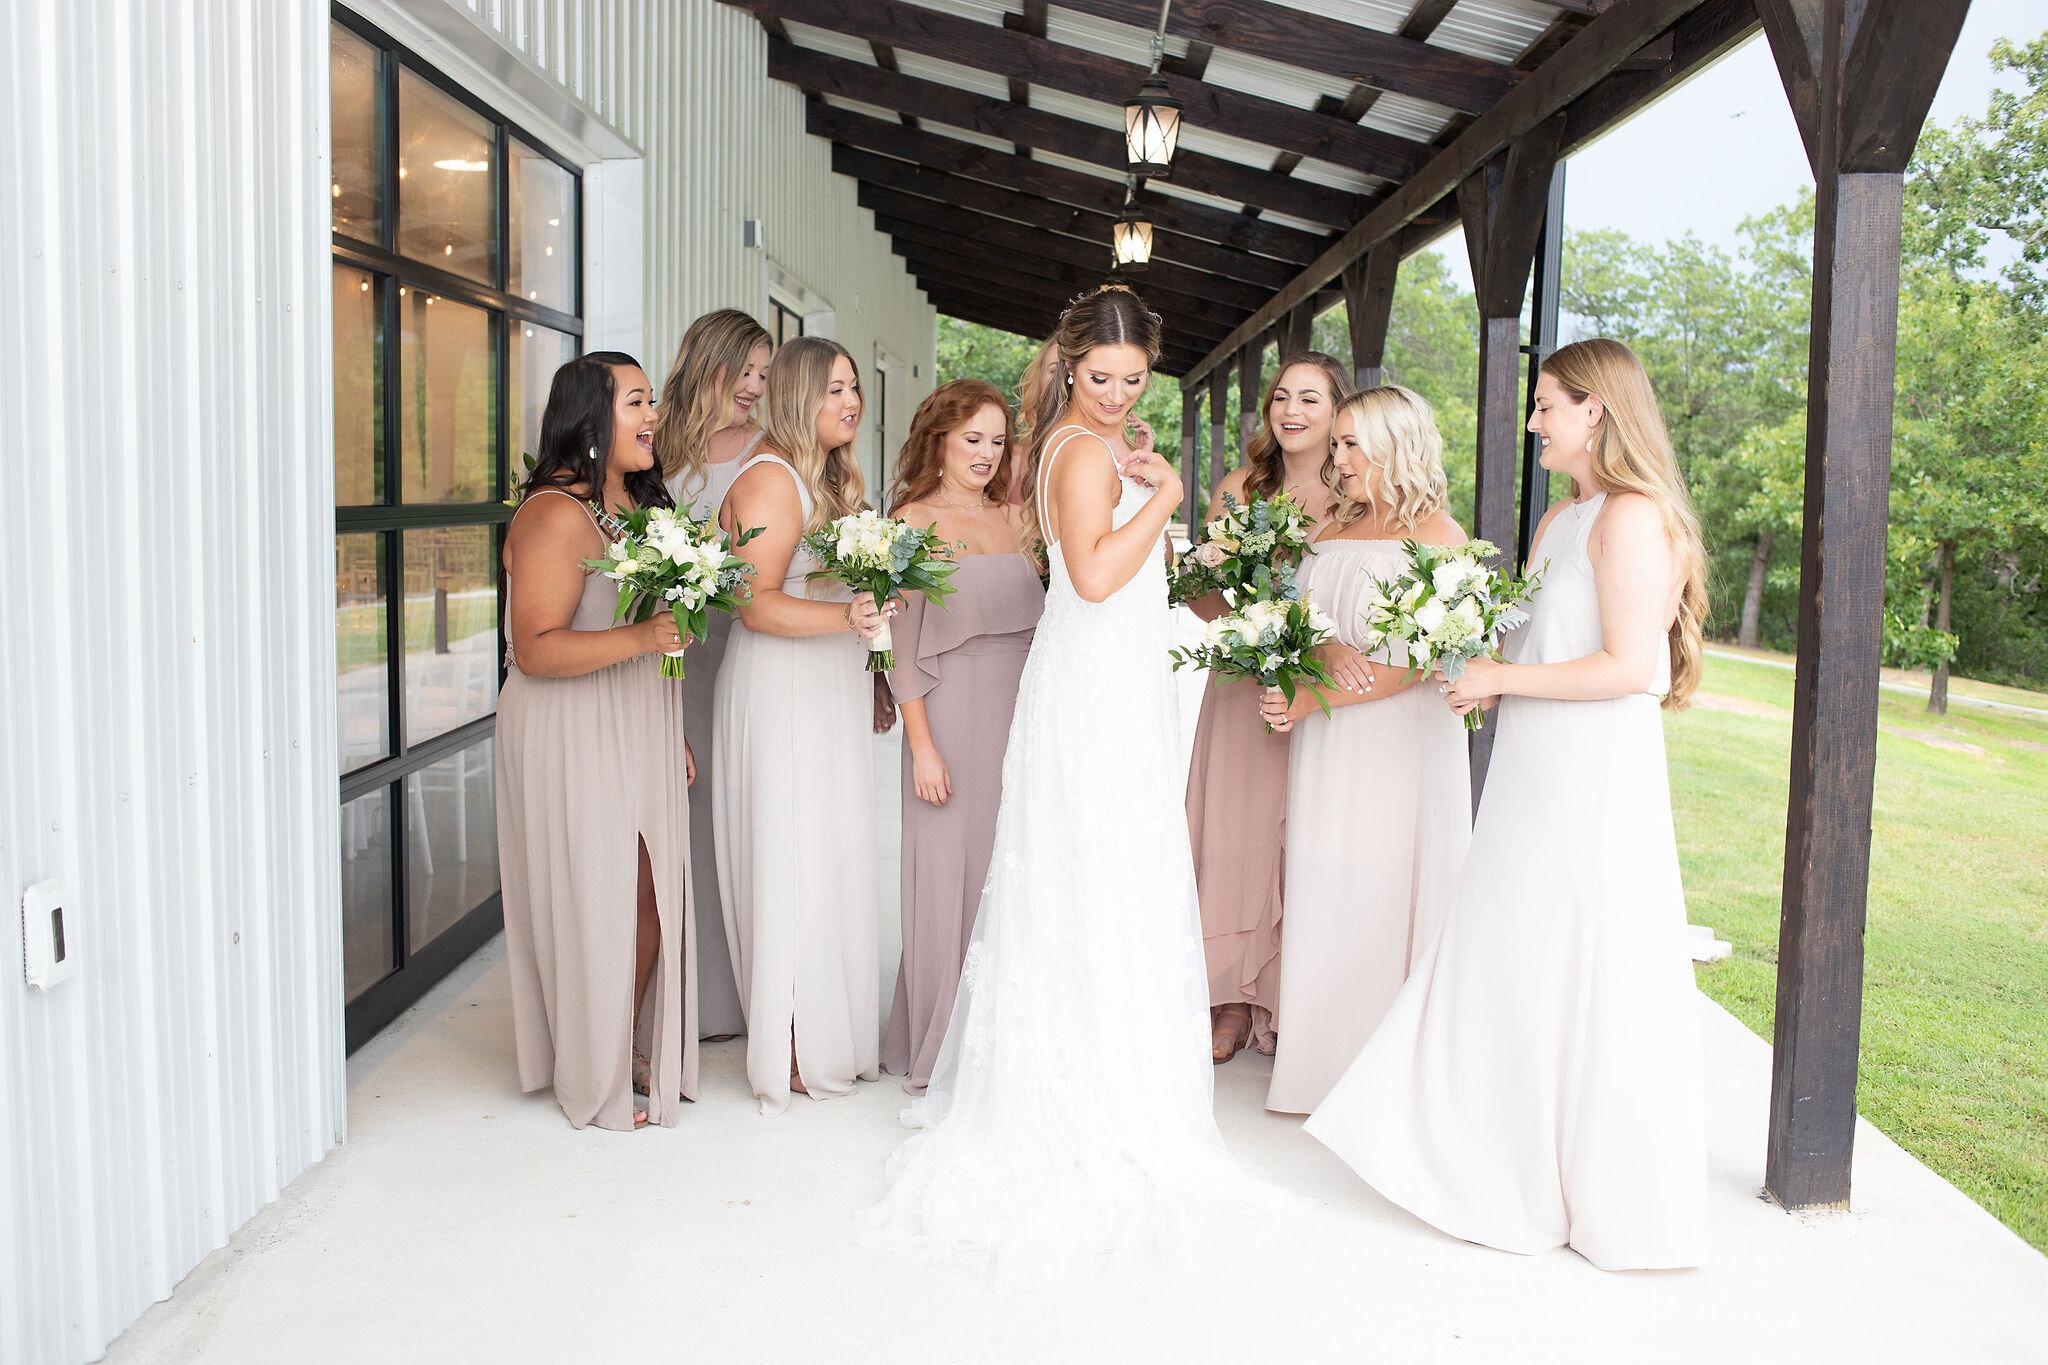 Oklahoma Summer Wedding Venue Dream Point Ranch 4a.jpg